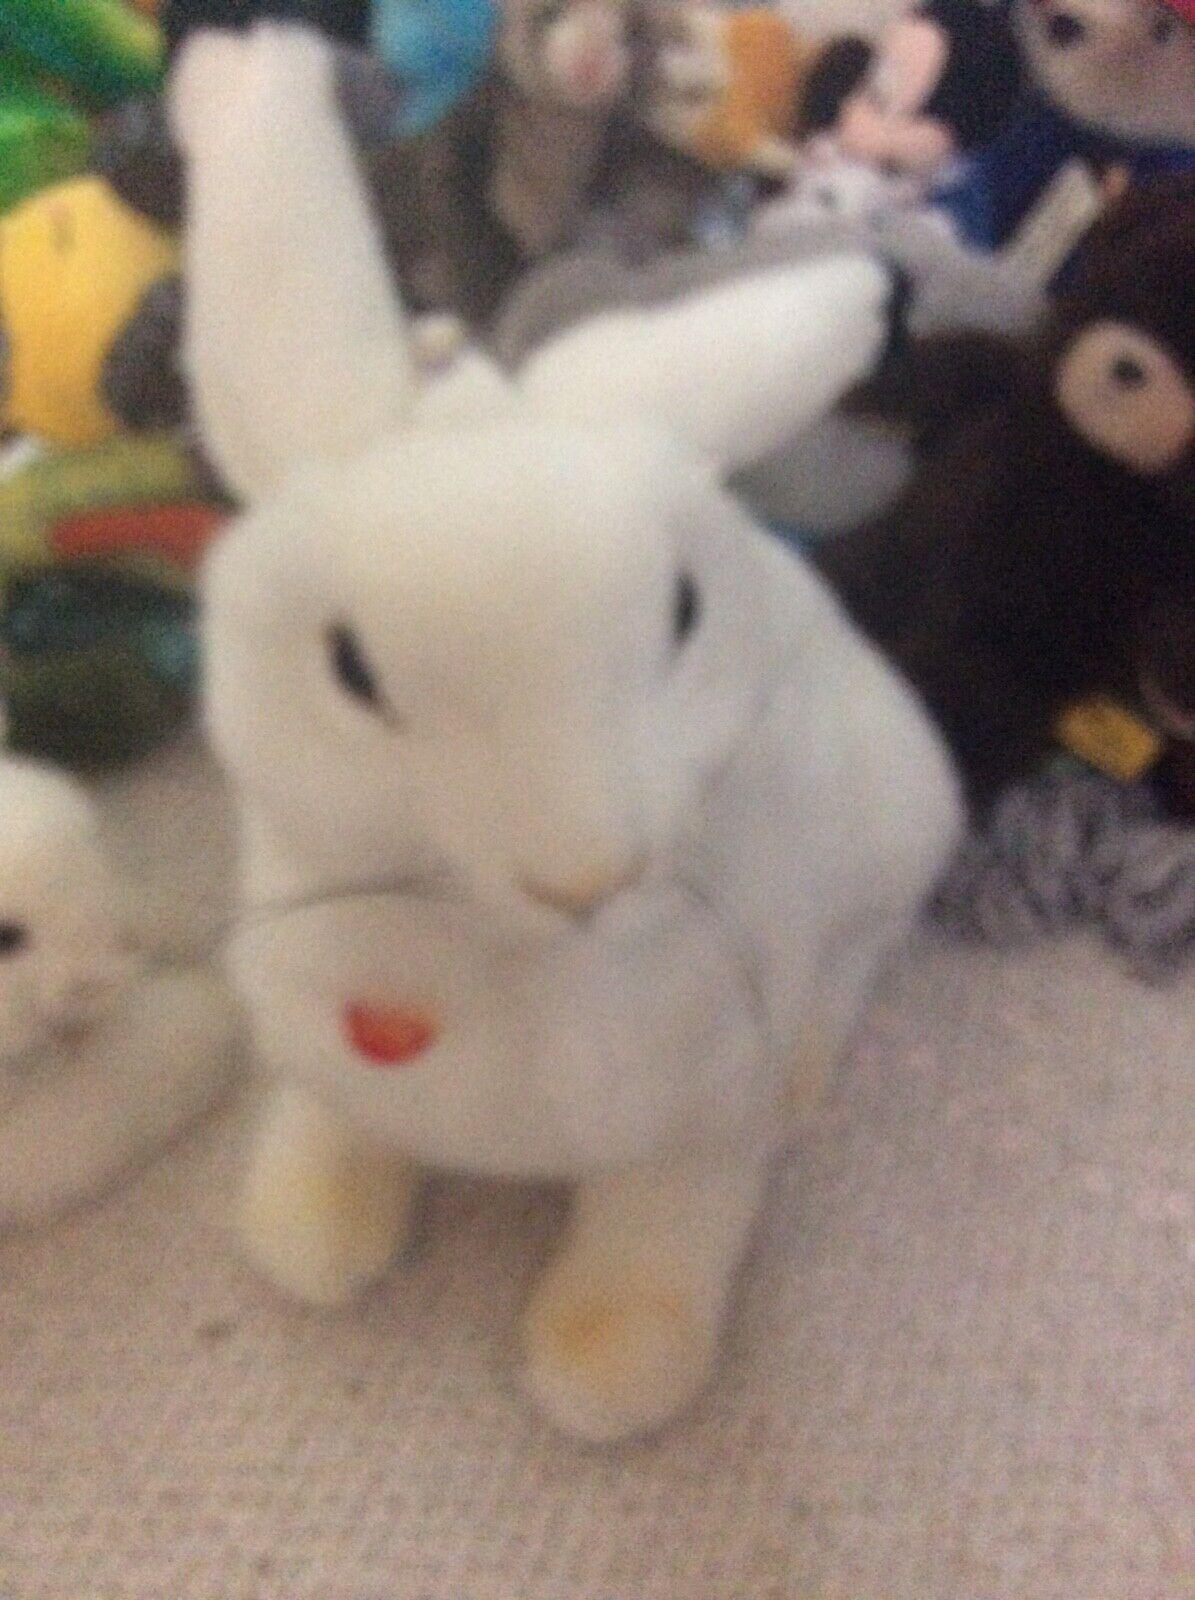 Studio Steiff Collector Edition Artic Rabbit - $150.00